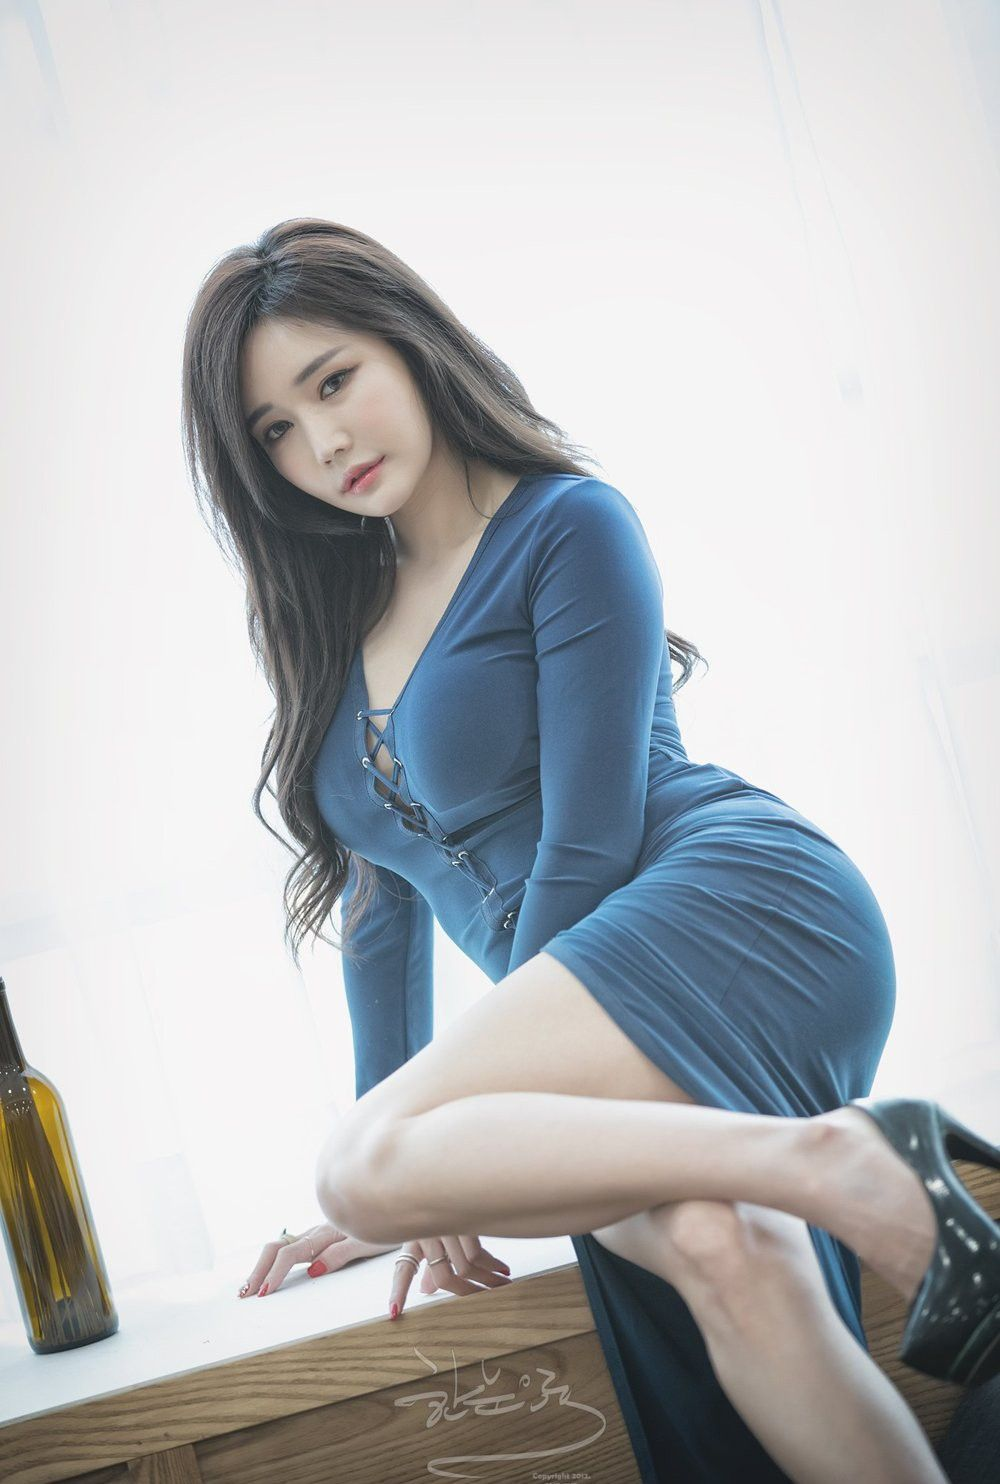 Pin by matryoshka bruh on kpop | Ulzzang korean girl